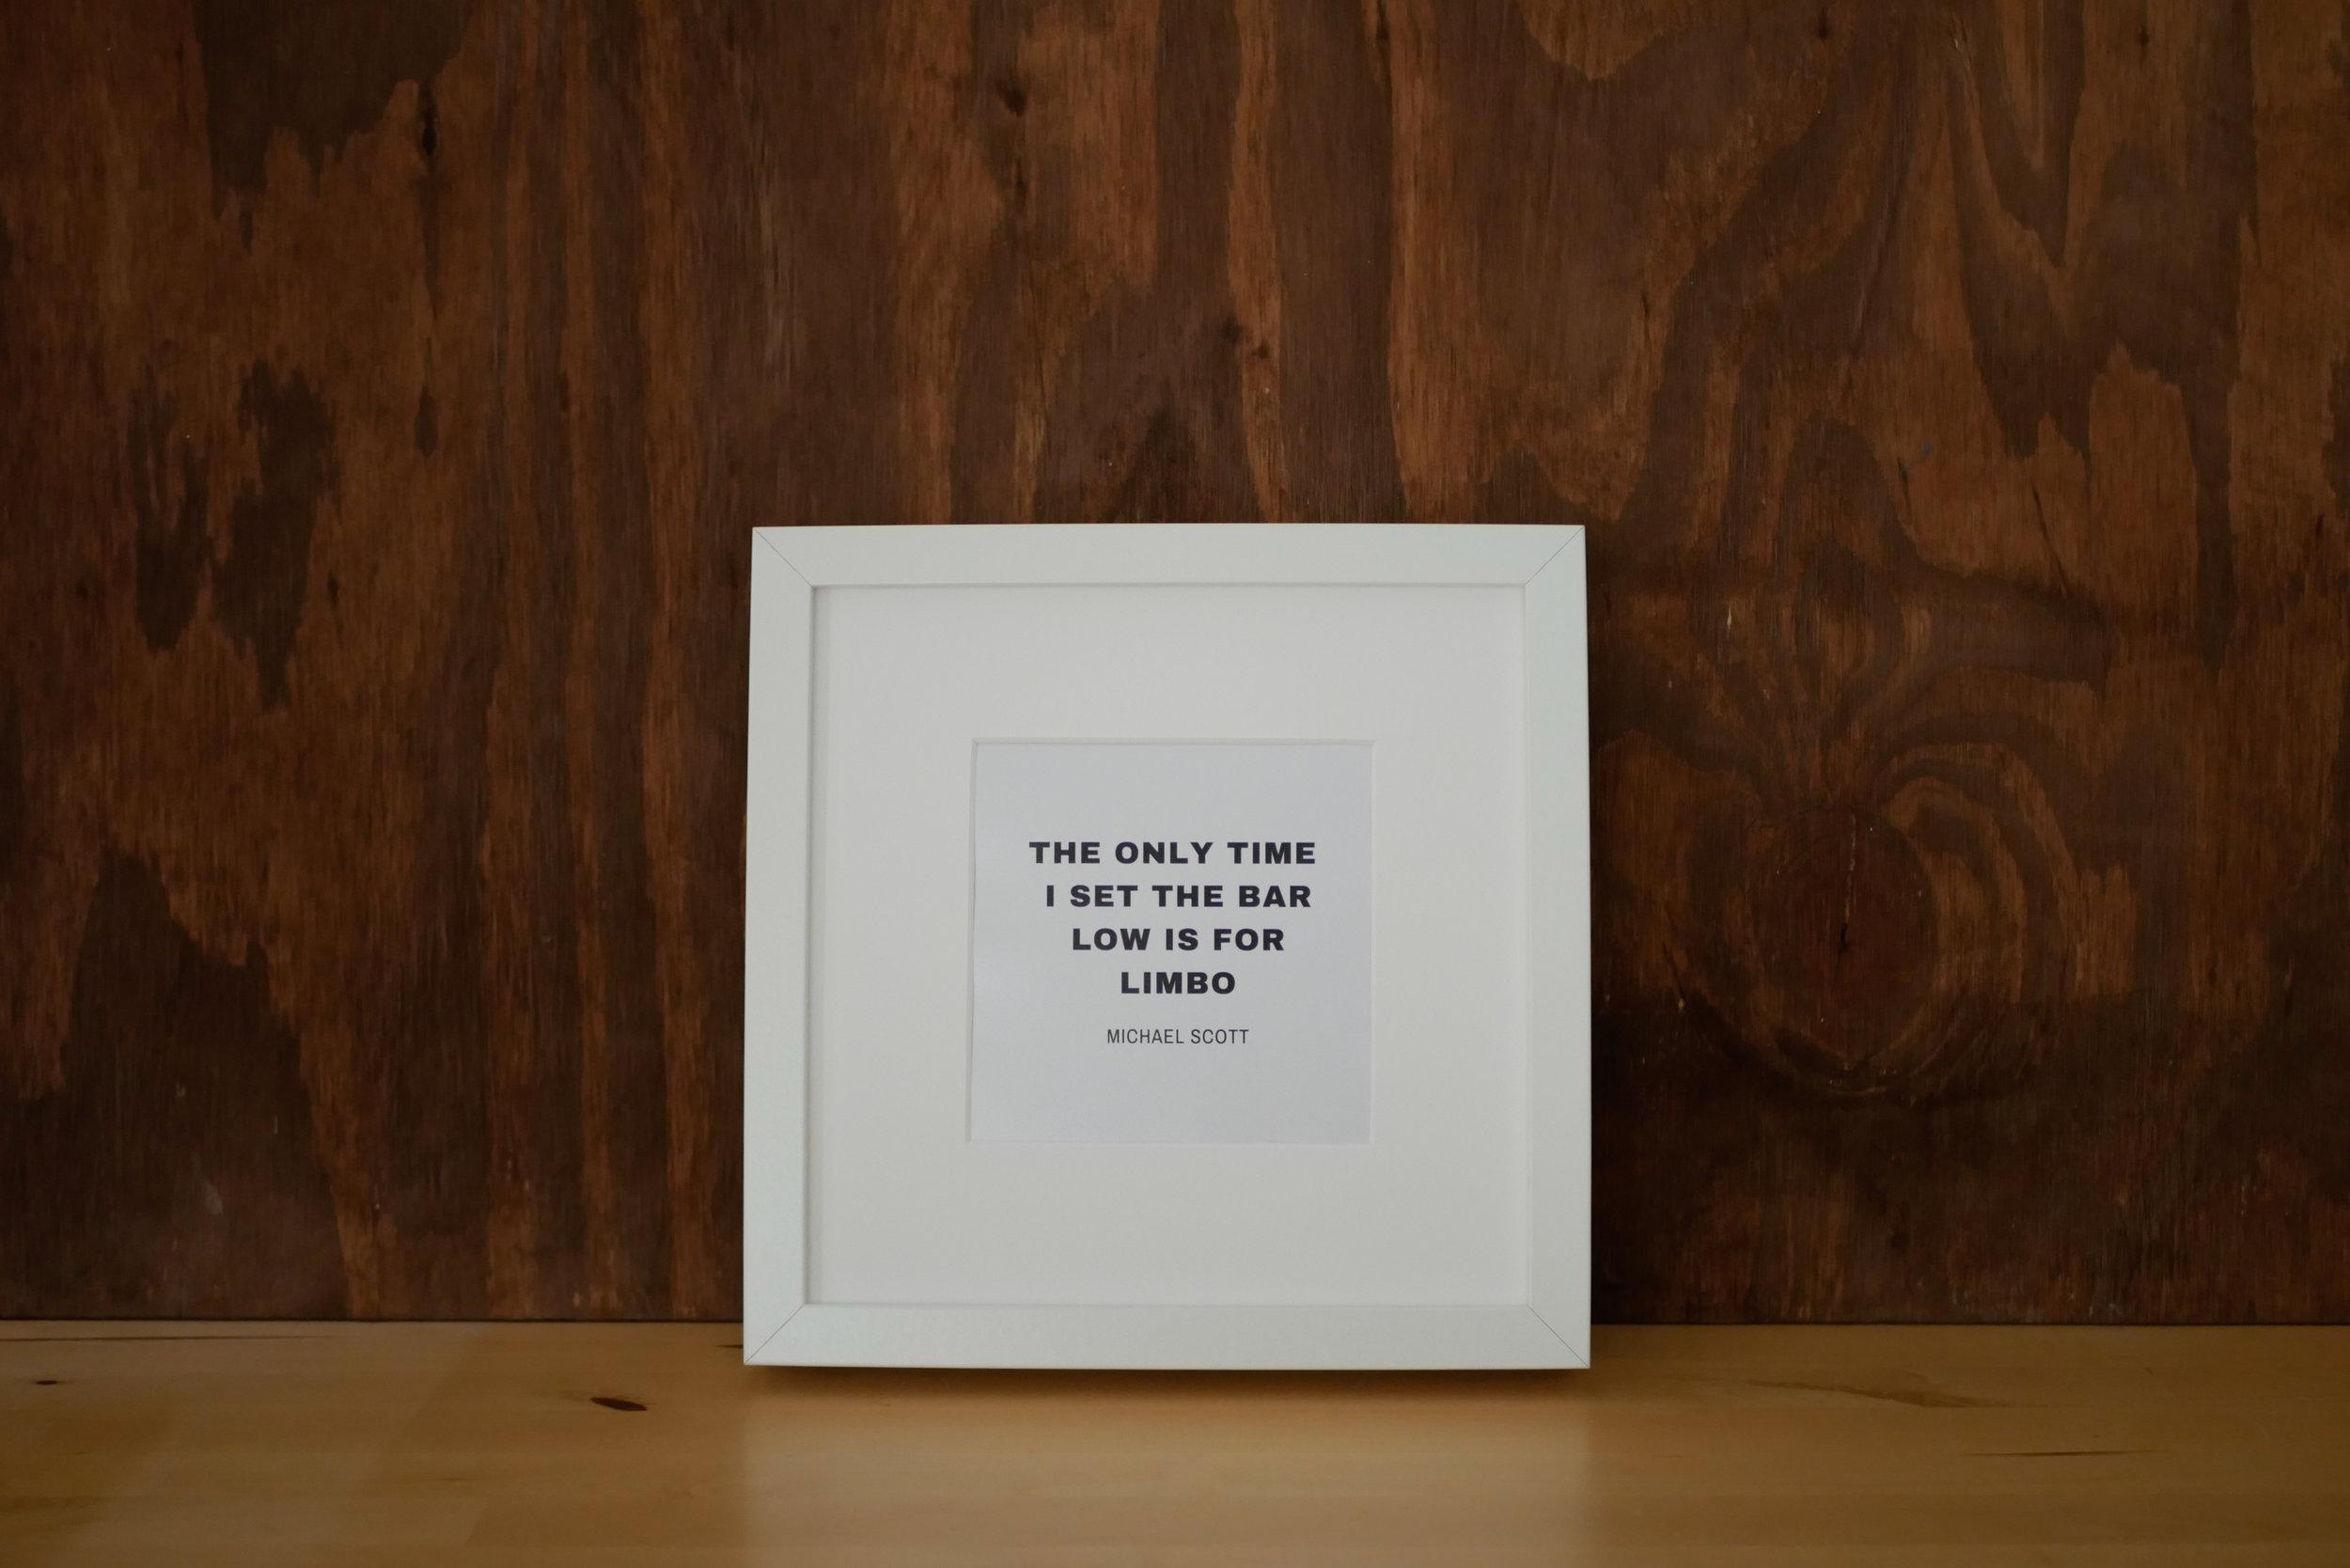 Limbo 8x8 - Shop Joy42 - The Office Artwork